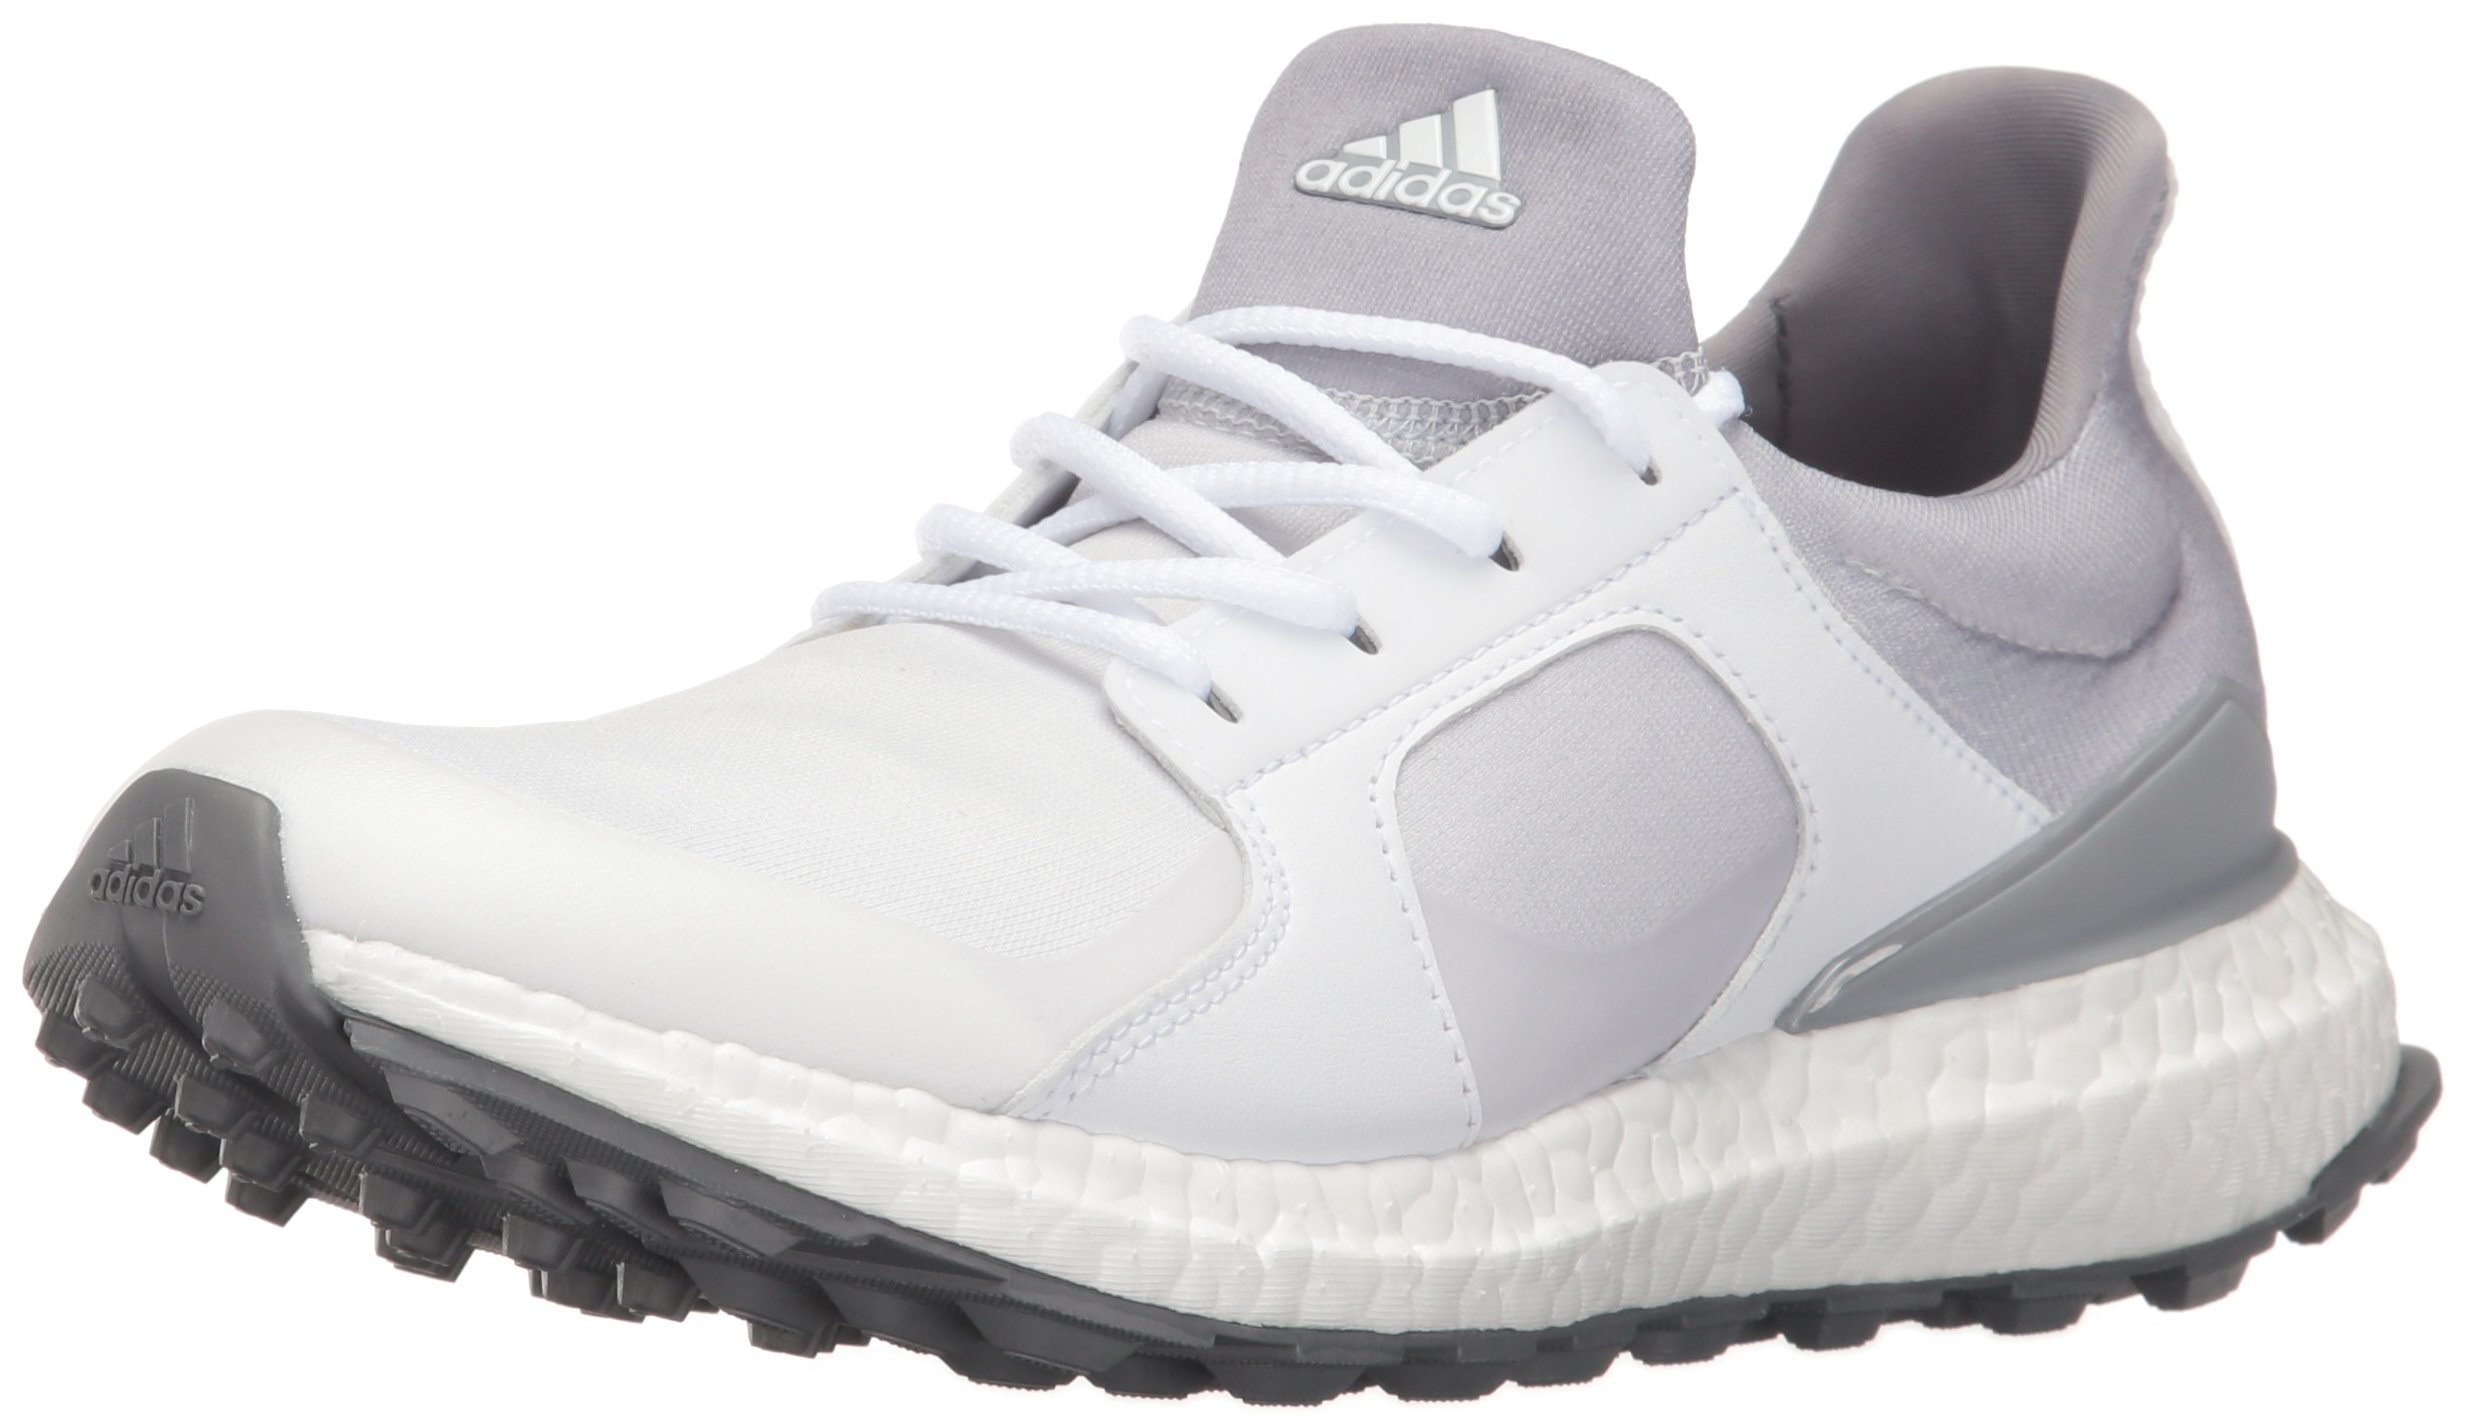 adidas Women's Climacross Boost Golf Shoe, White, 6.5 M US